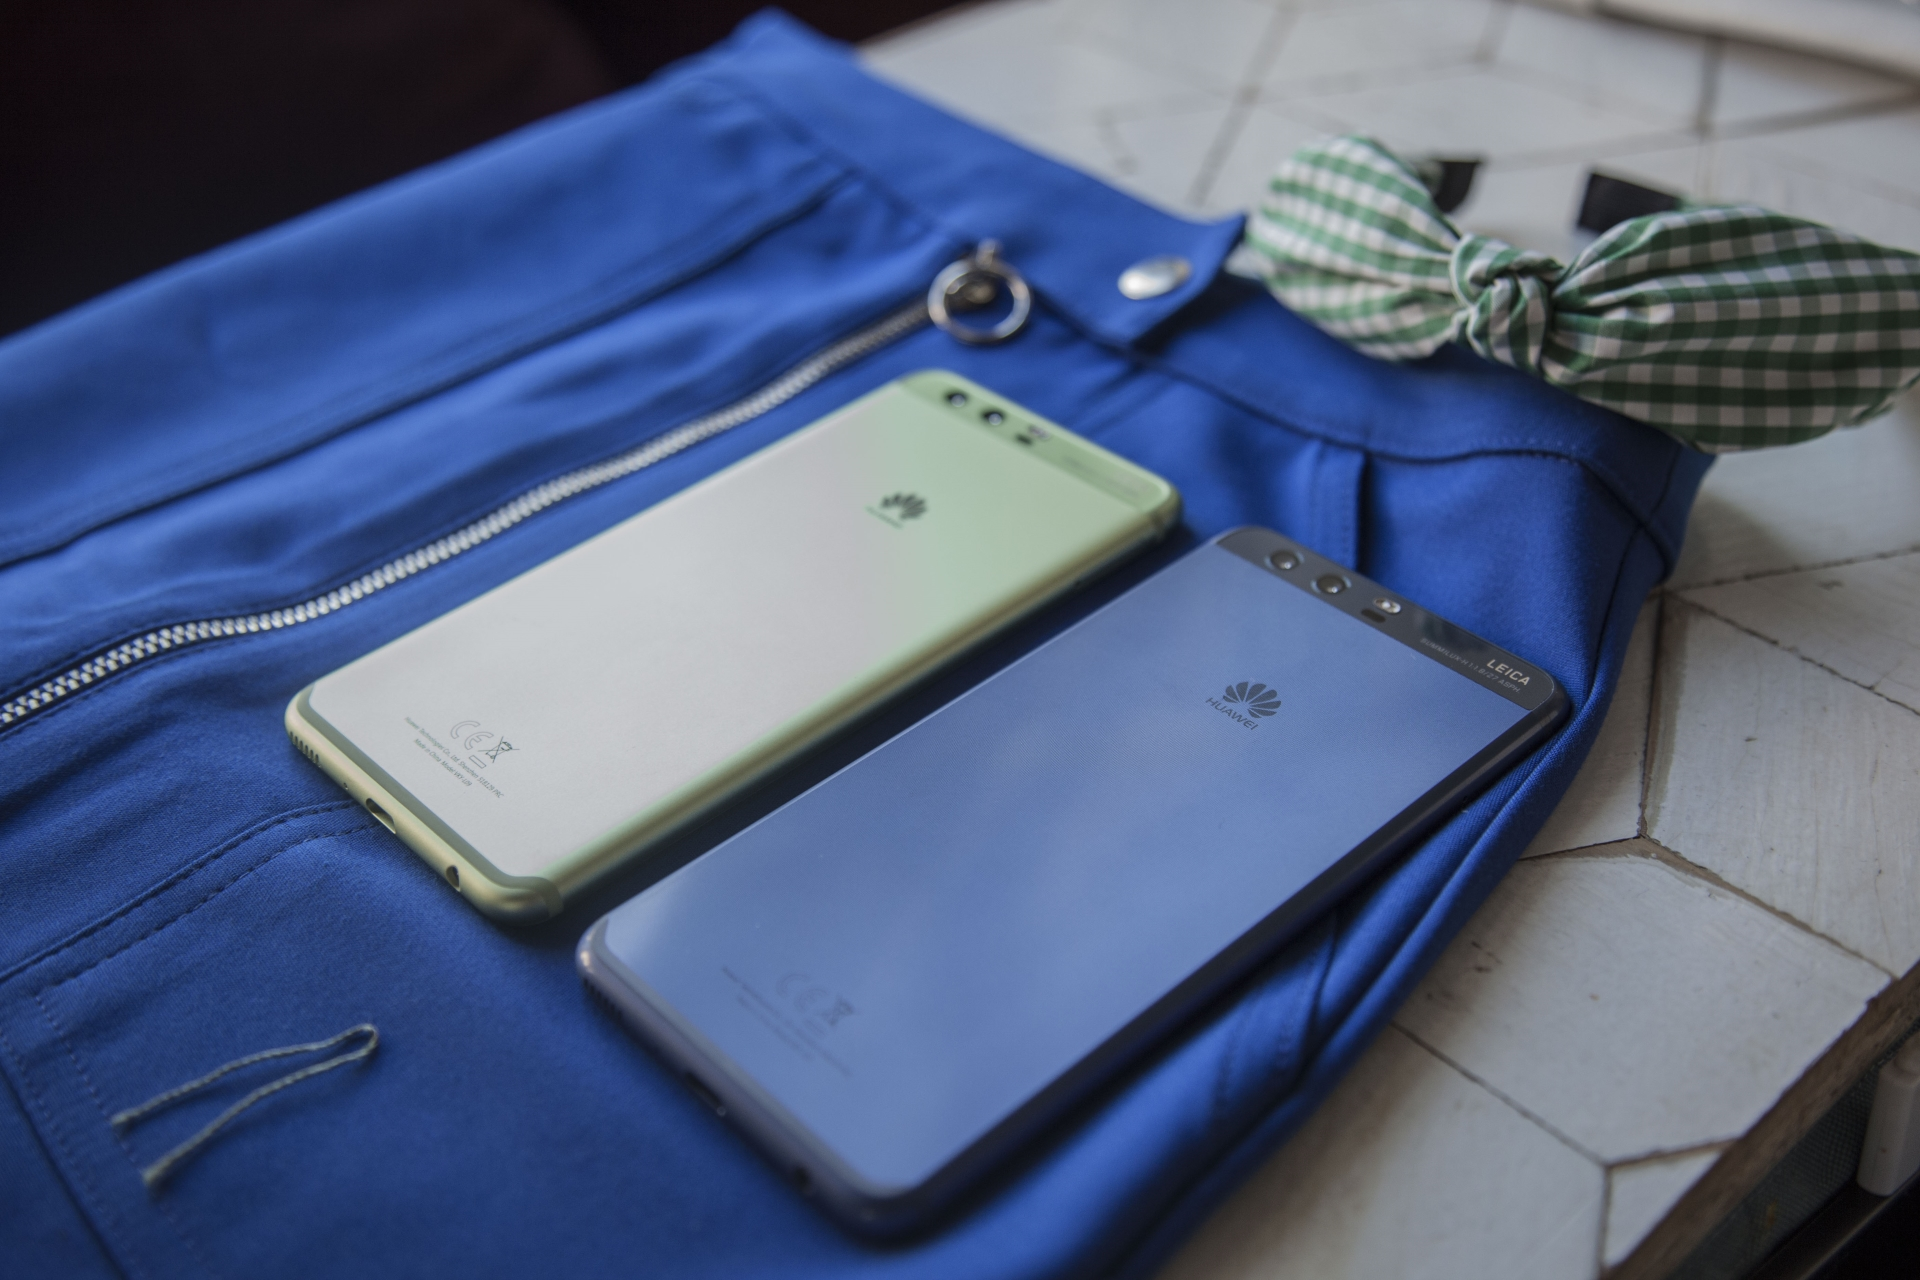 Huawei P10 e P10 Plus nei colori Greenery e Dazzling Blue con Pantone